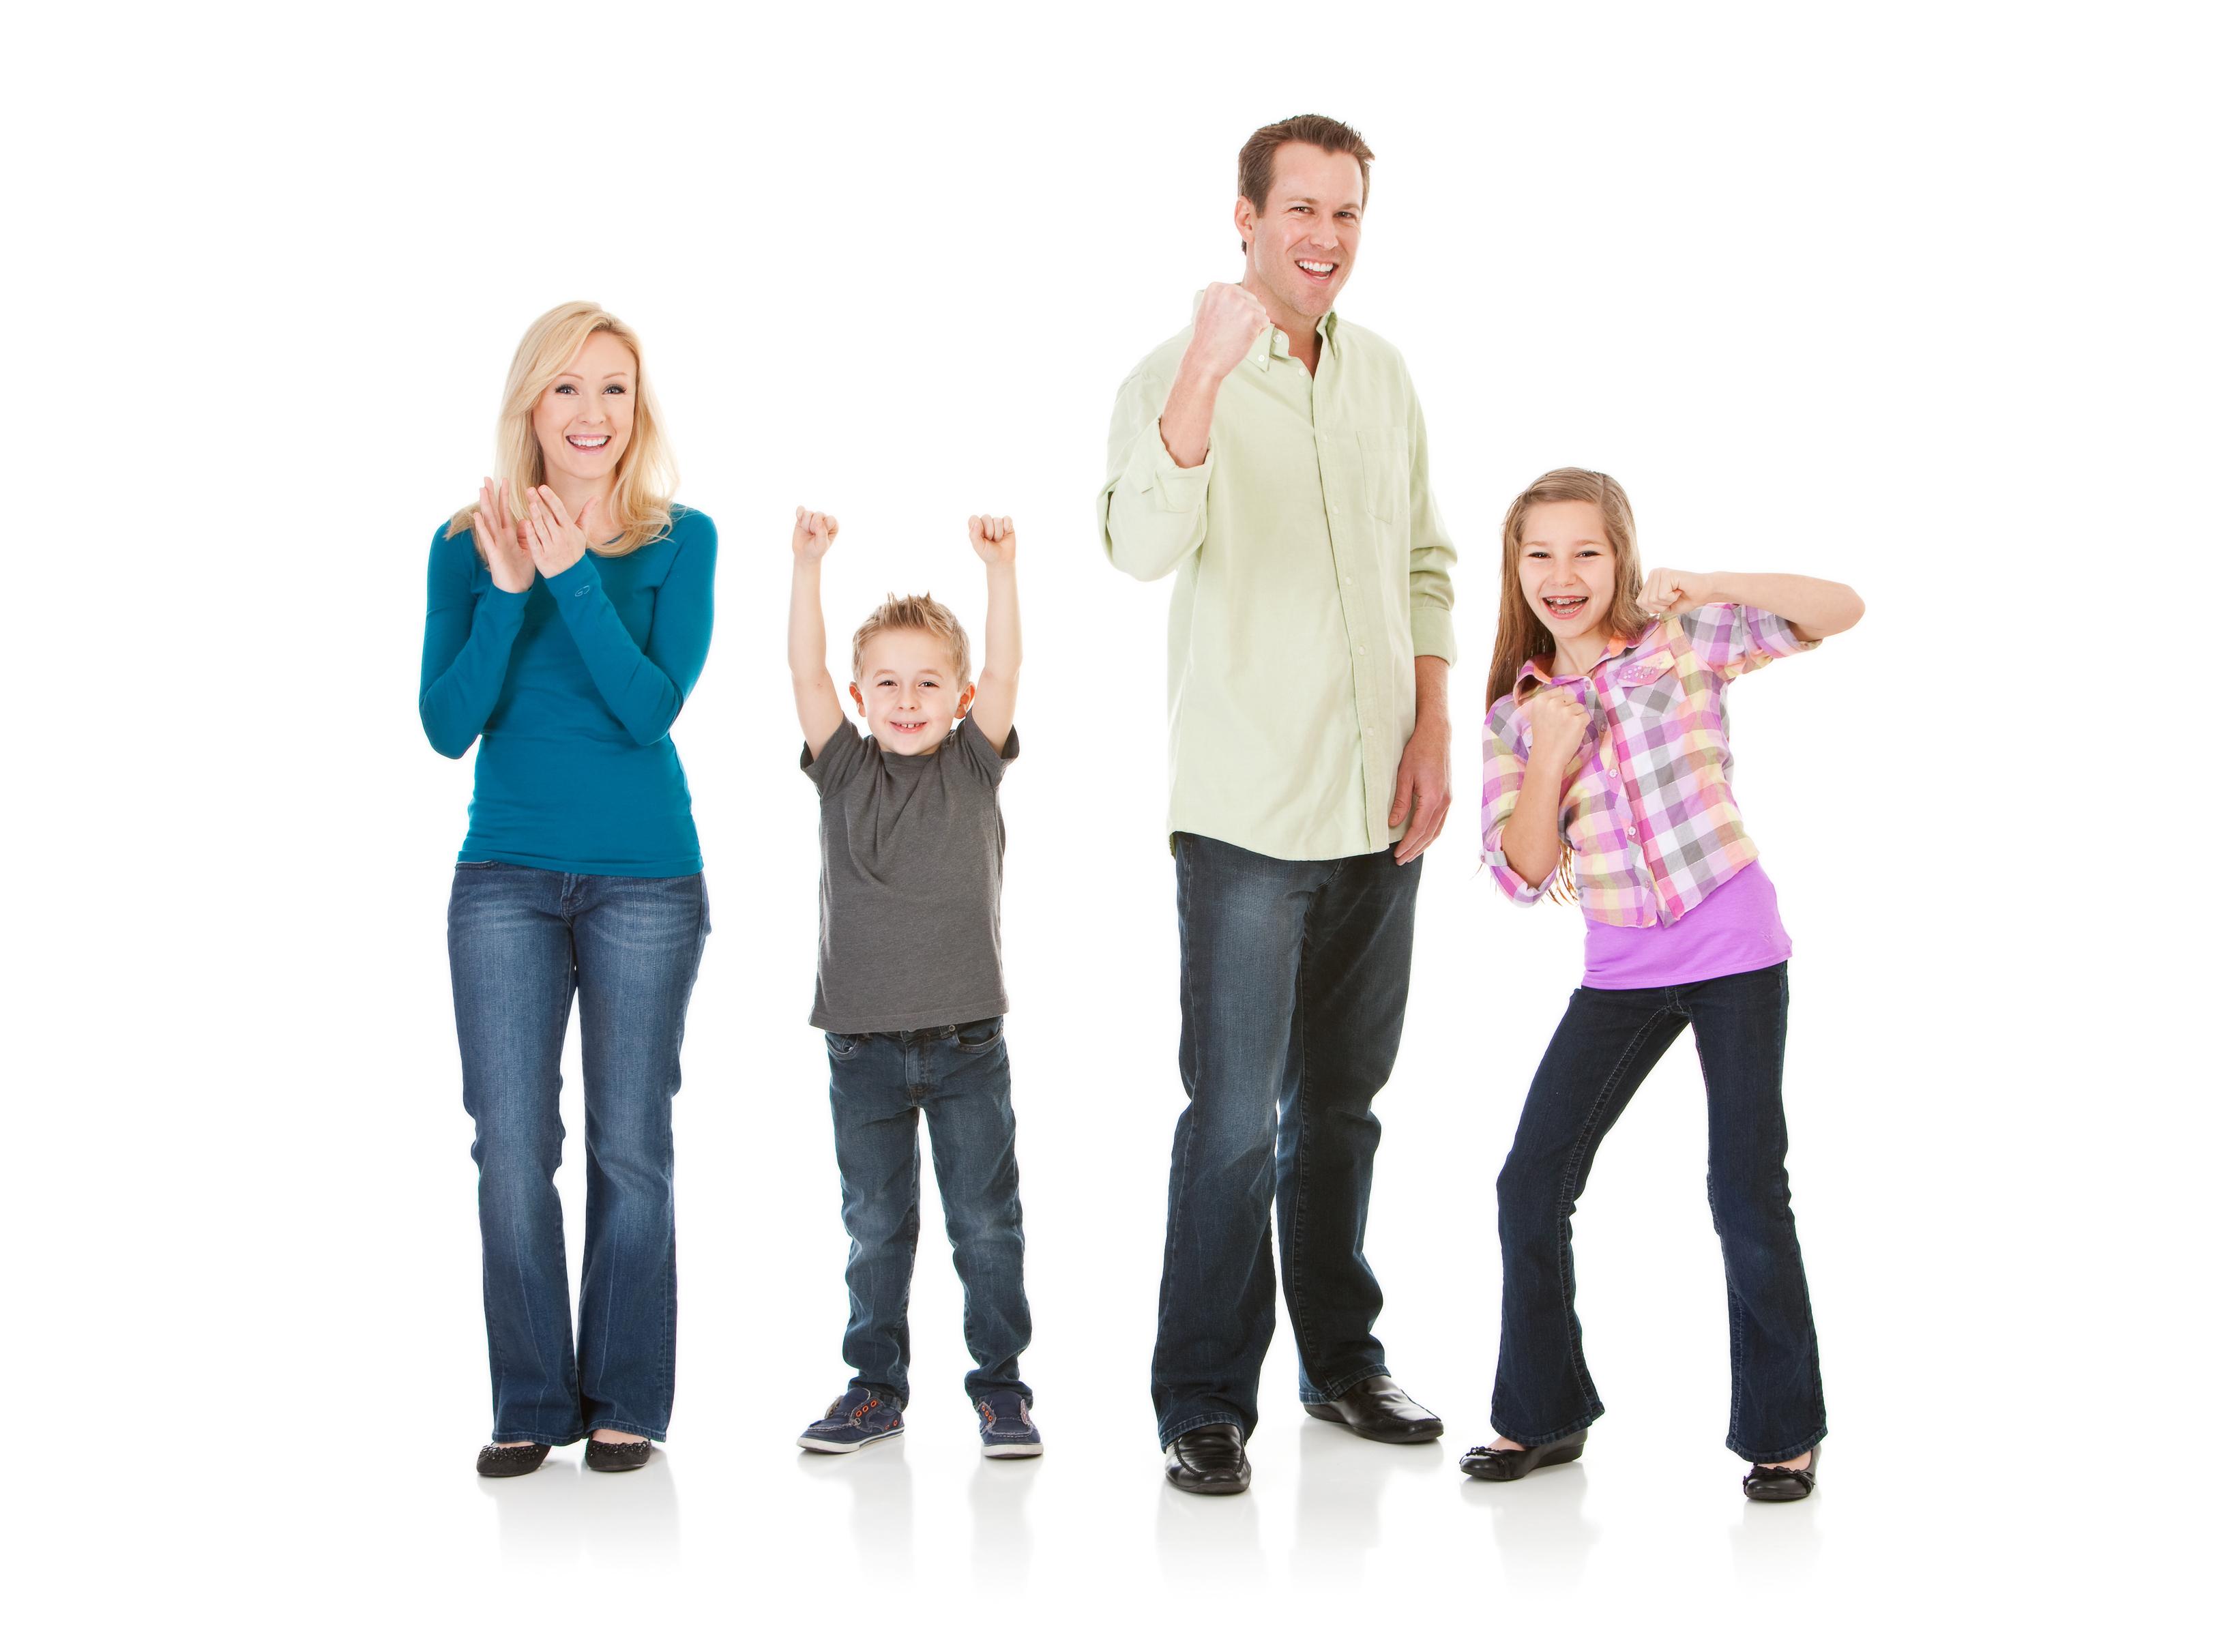 posed stock photo family